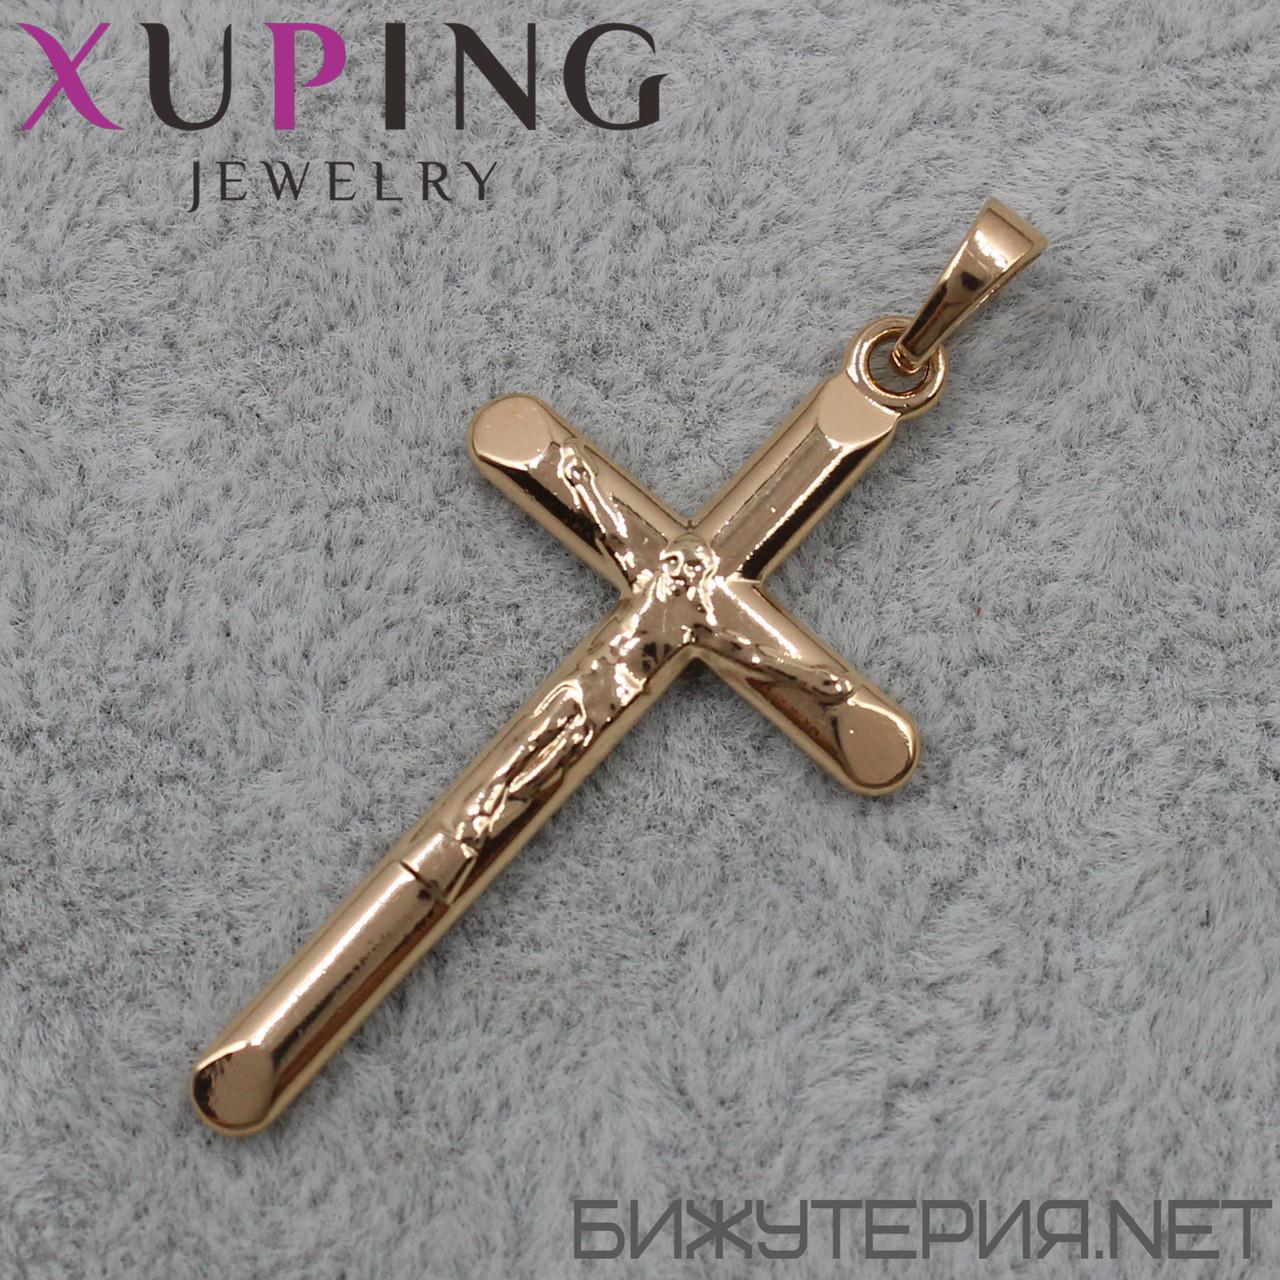 Крестик Xuping медицинское золото 36 х 19 мм